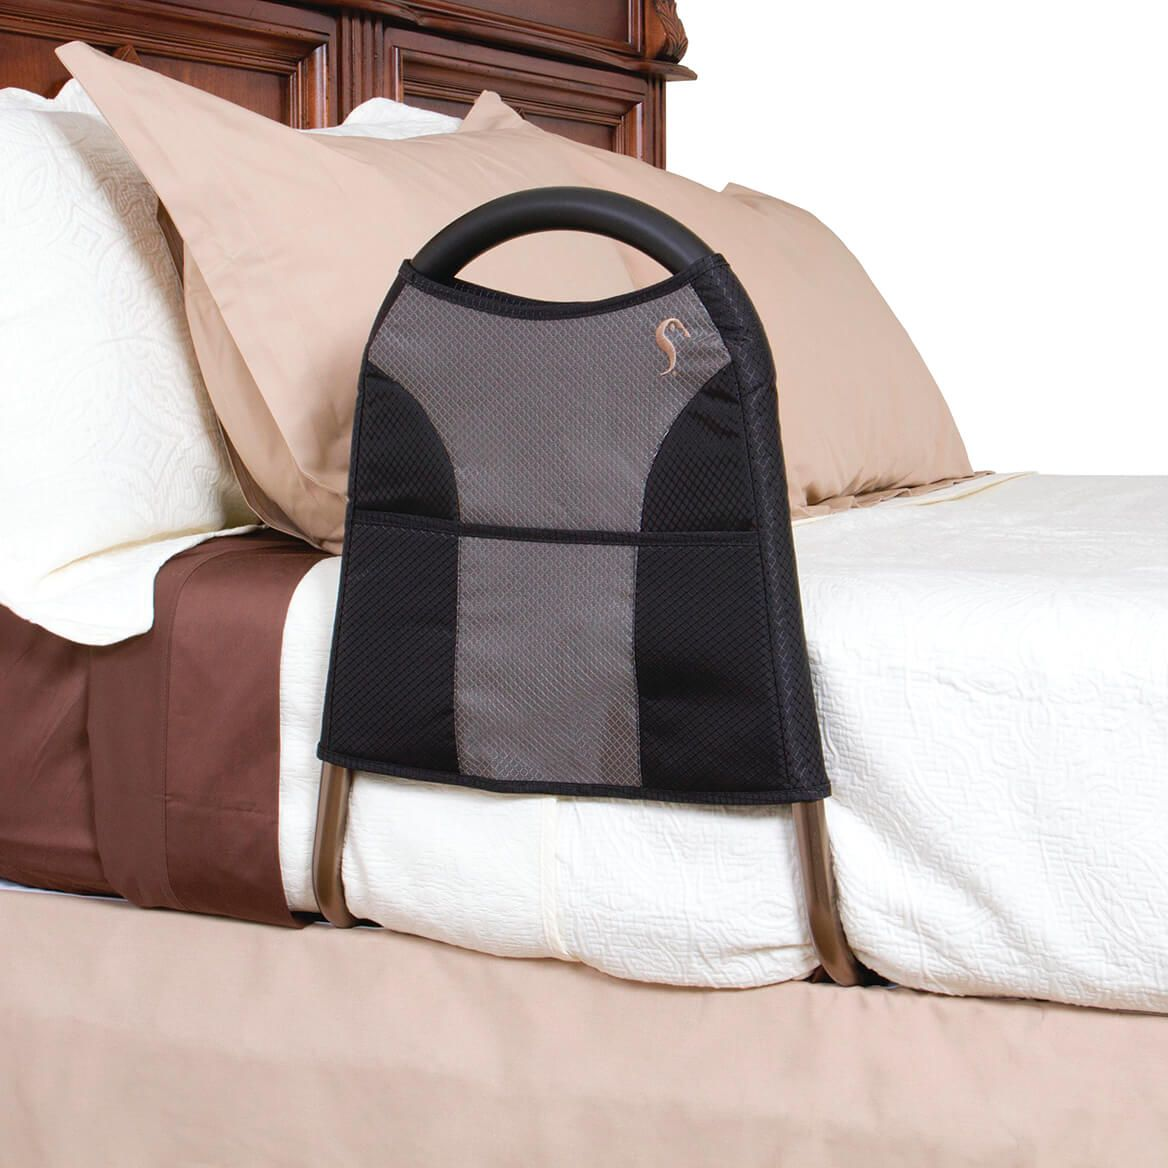 Portable Bed Rails-339399